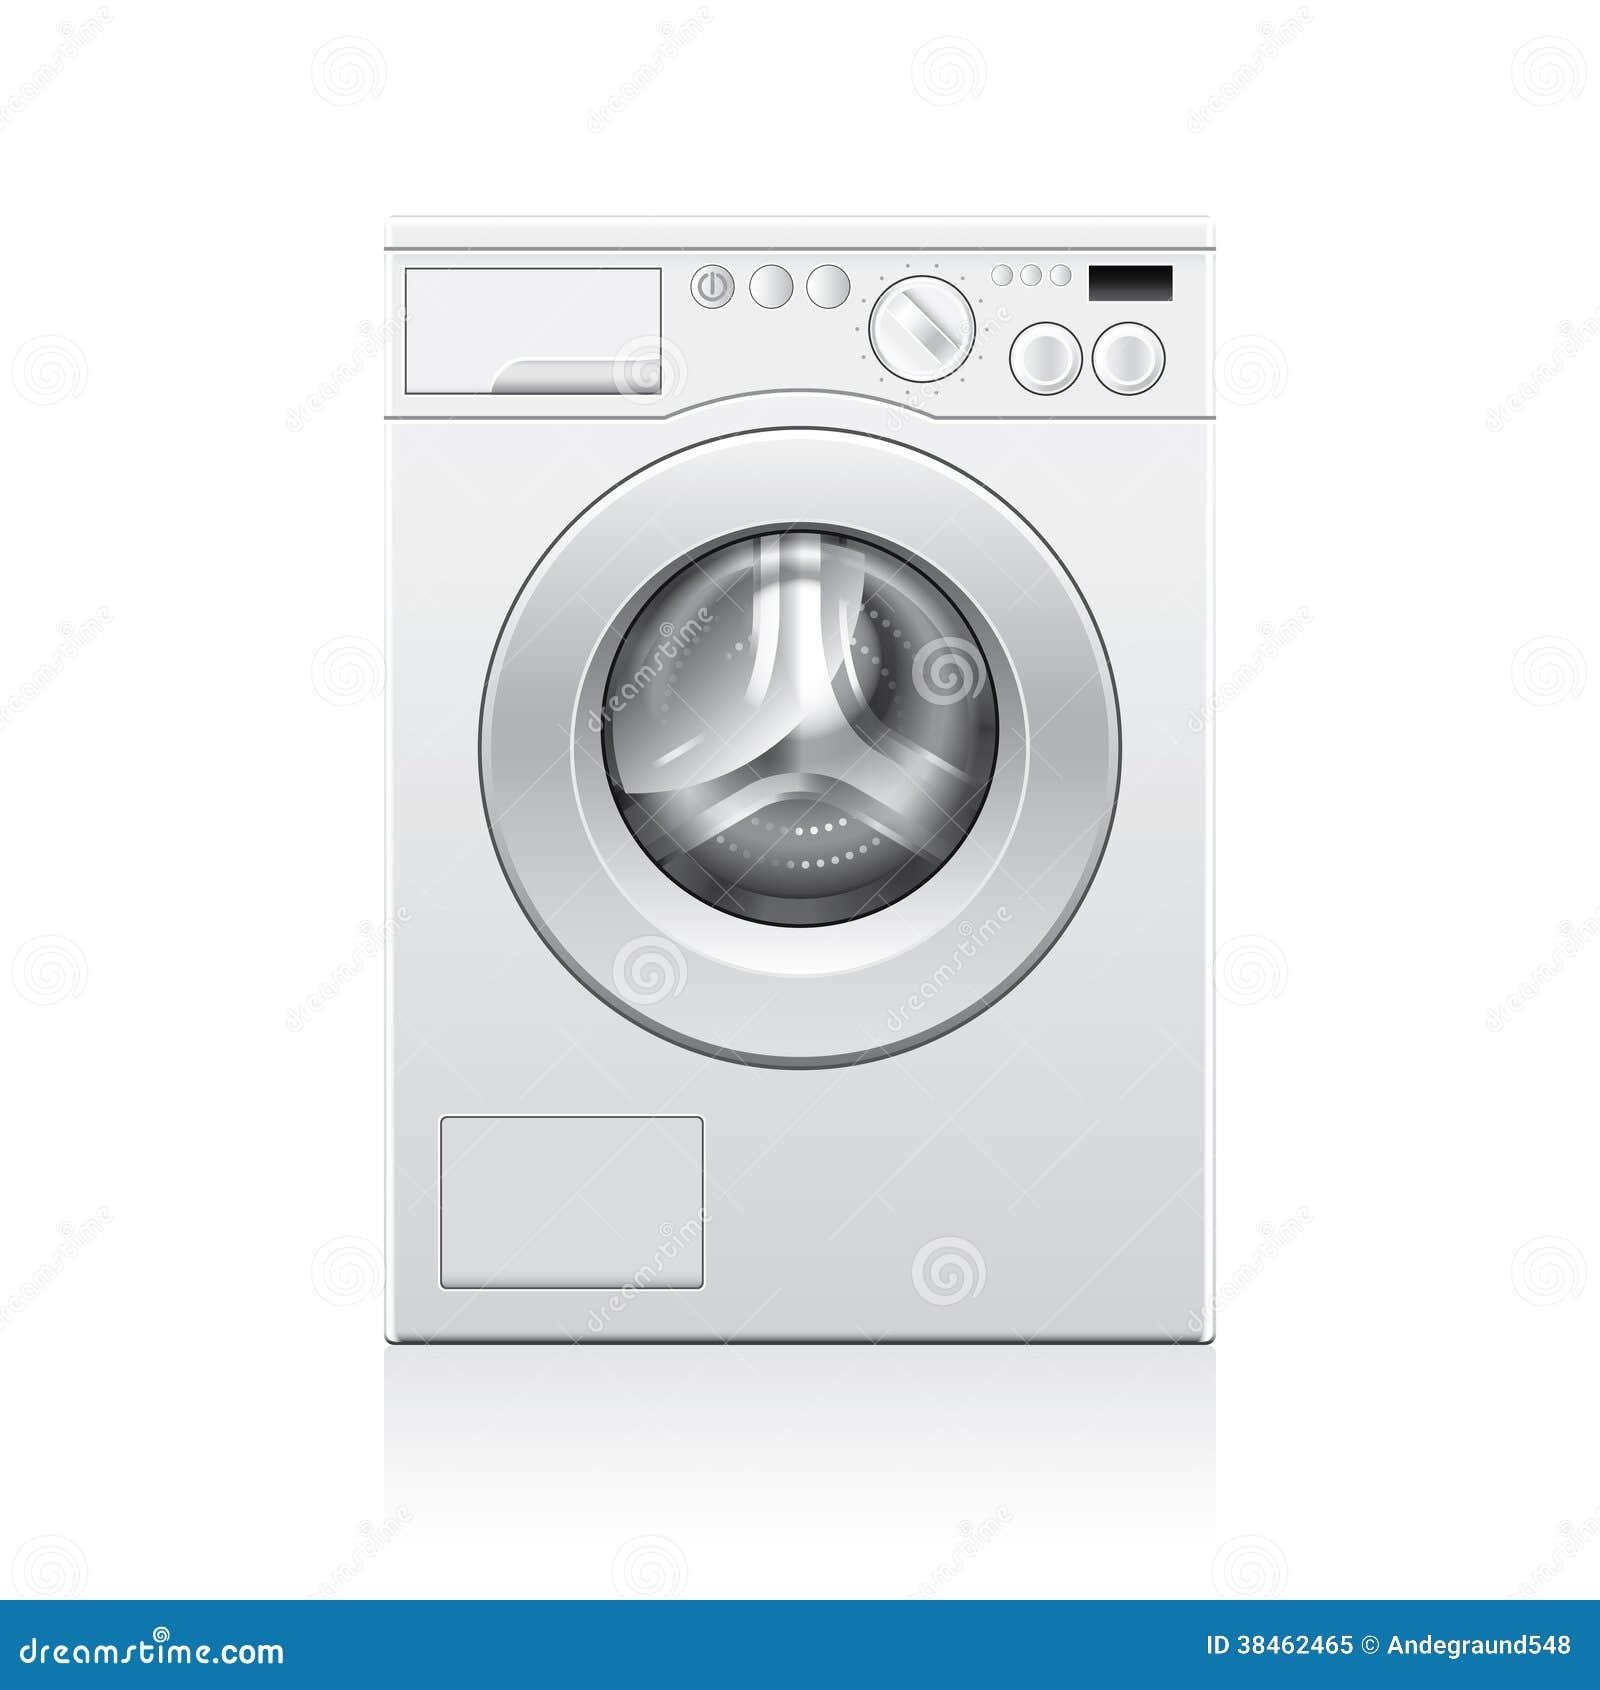 waschmaschine clipart inspirierendes design. Black Bedroom Furniture Sets. Home Design Ideas